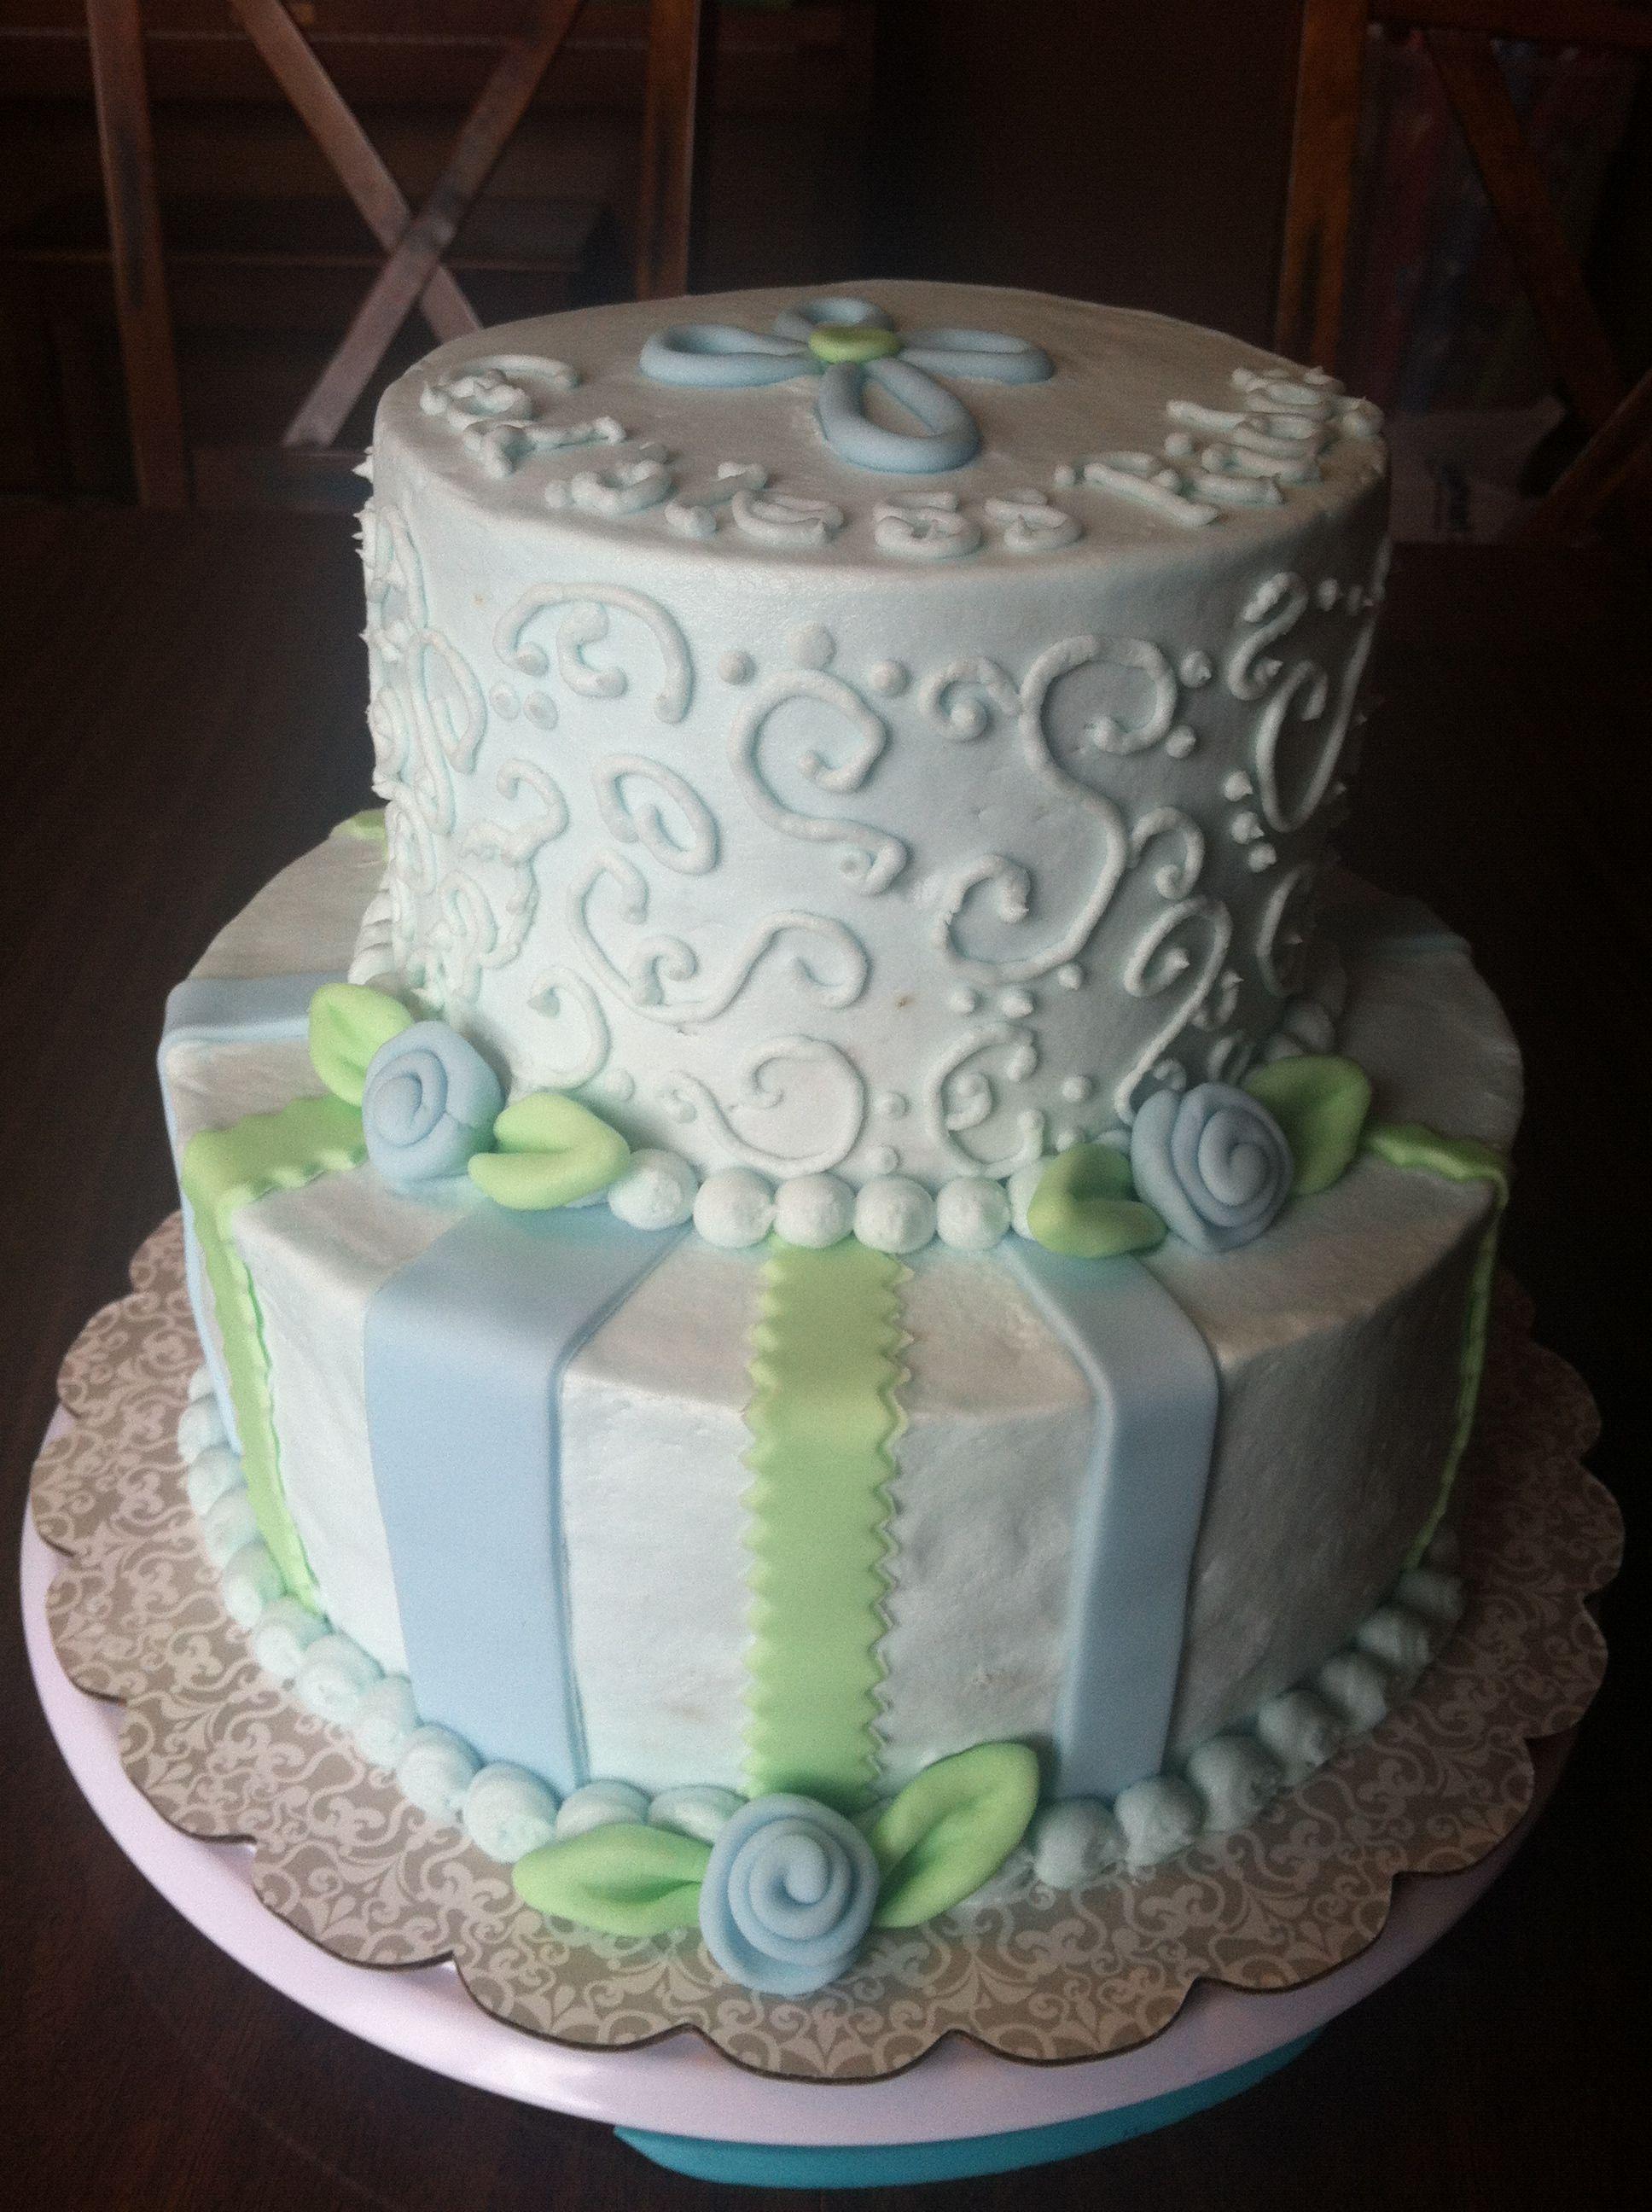 ... cake i tres leches cake pig cake cake in a mug rum cake i louisa s